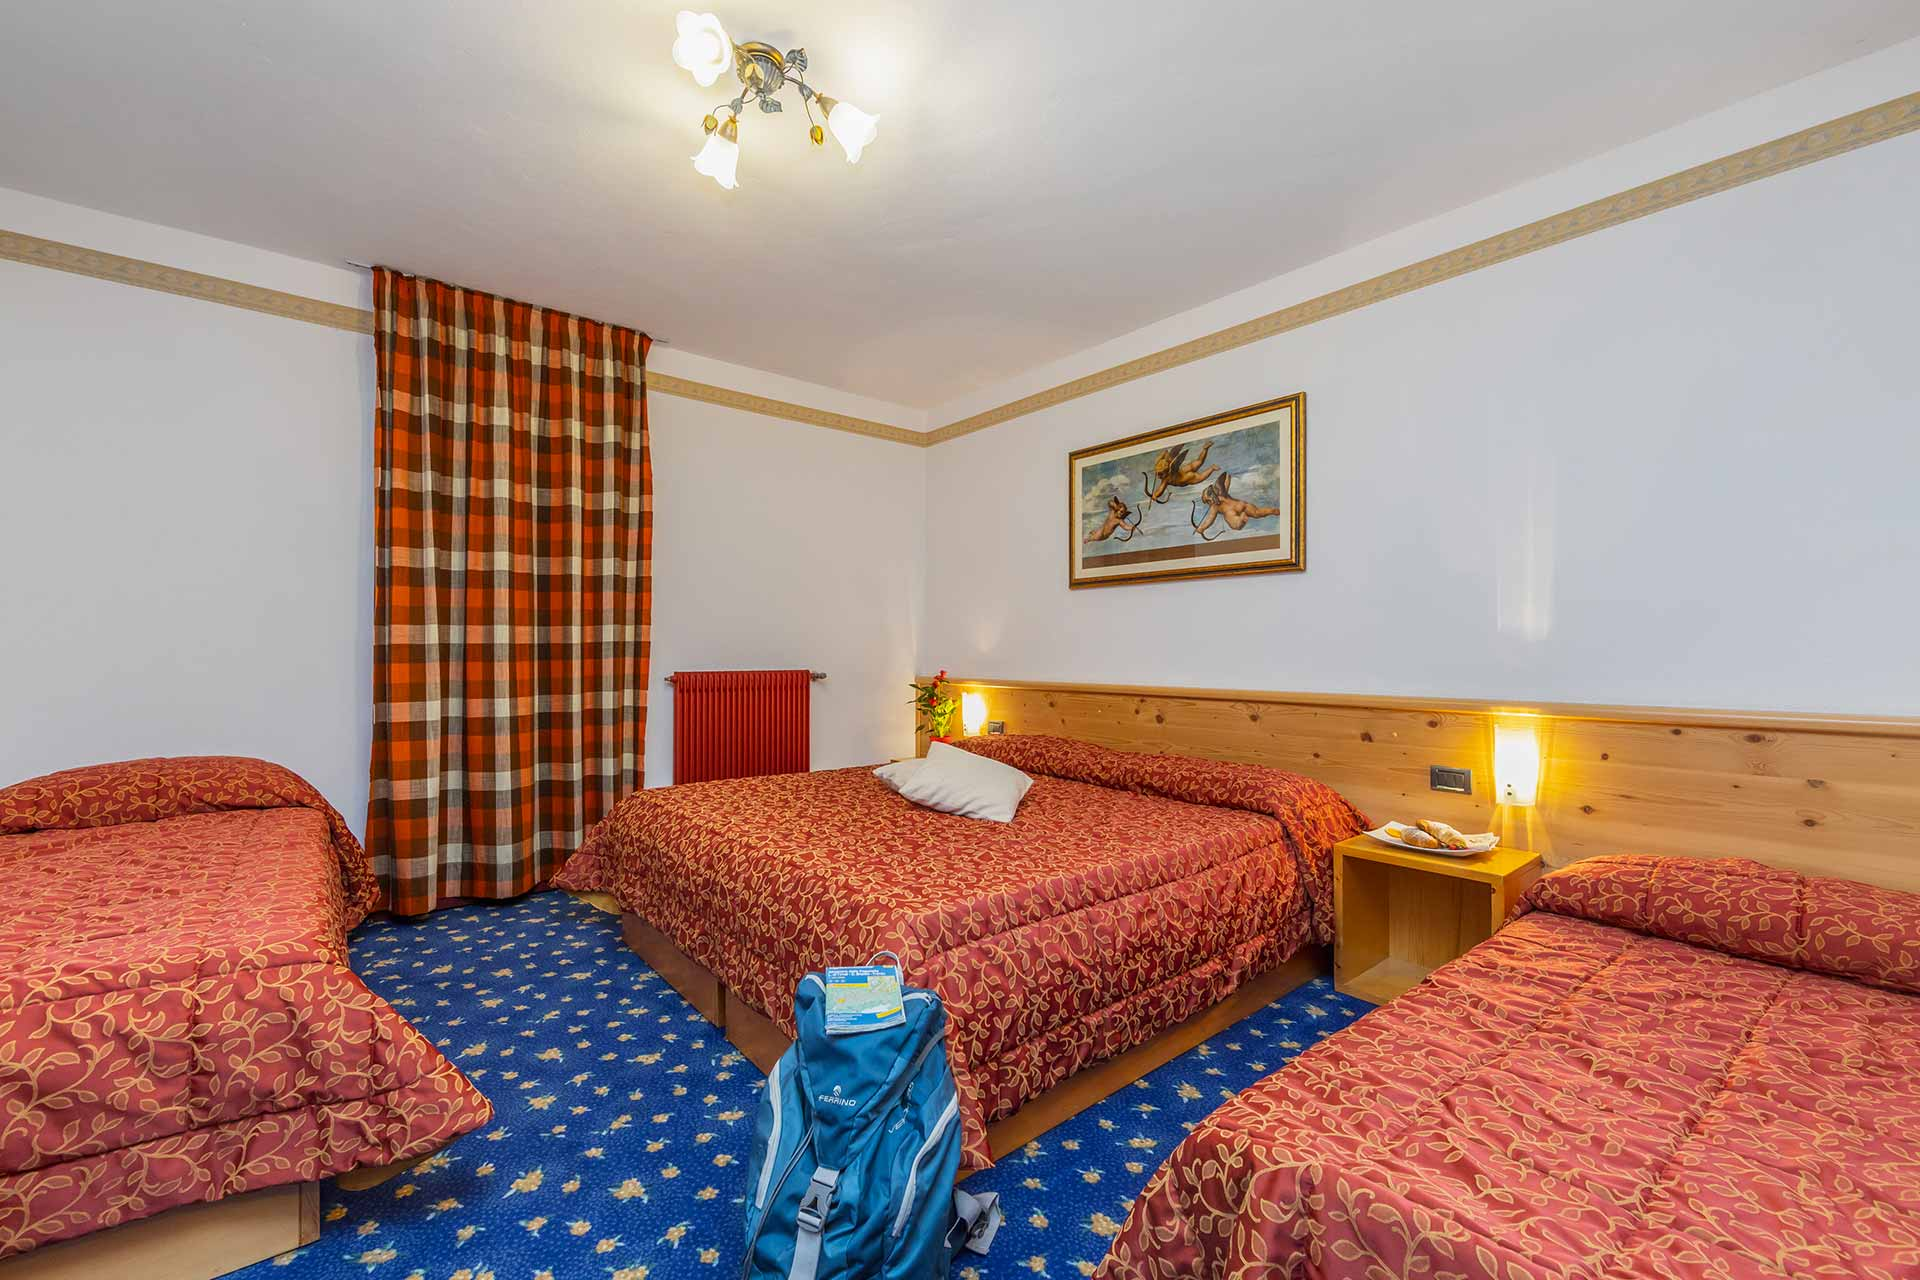 Hotel Tre Stelle Miravalle le camere